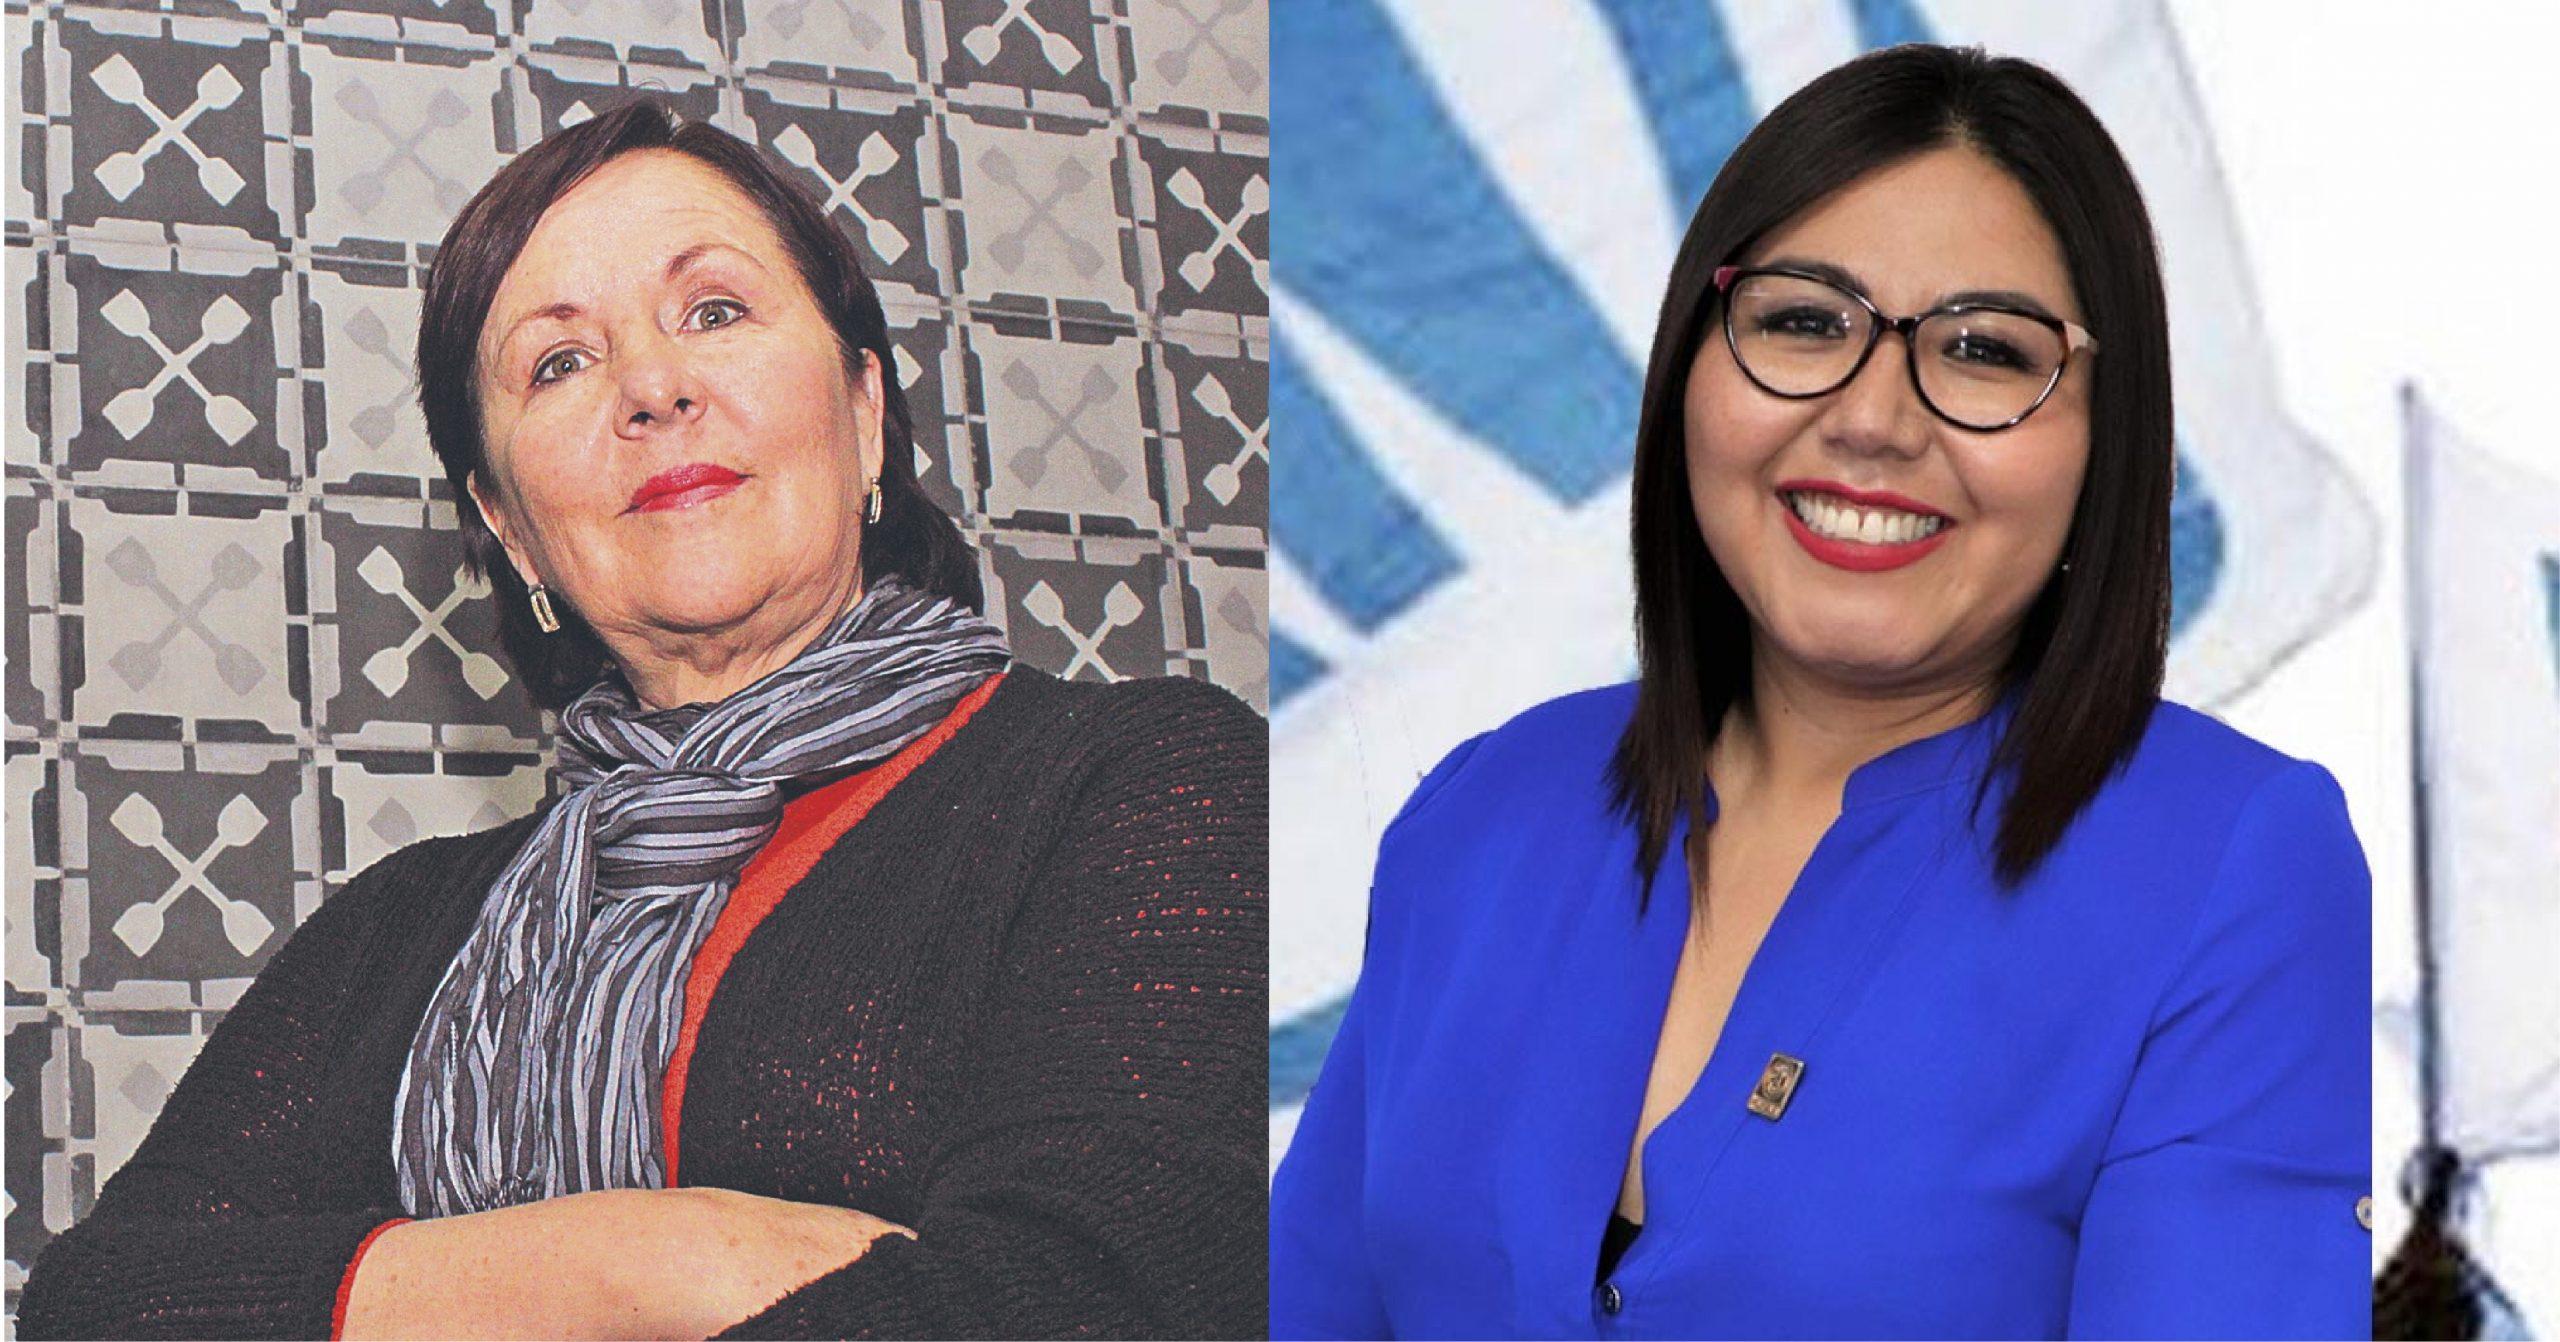 Aranda y Huerta, militantes fuertes rumbo a la dirigencia del PAN Puebla